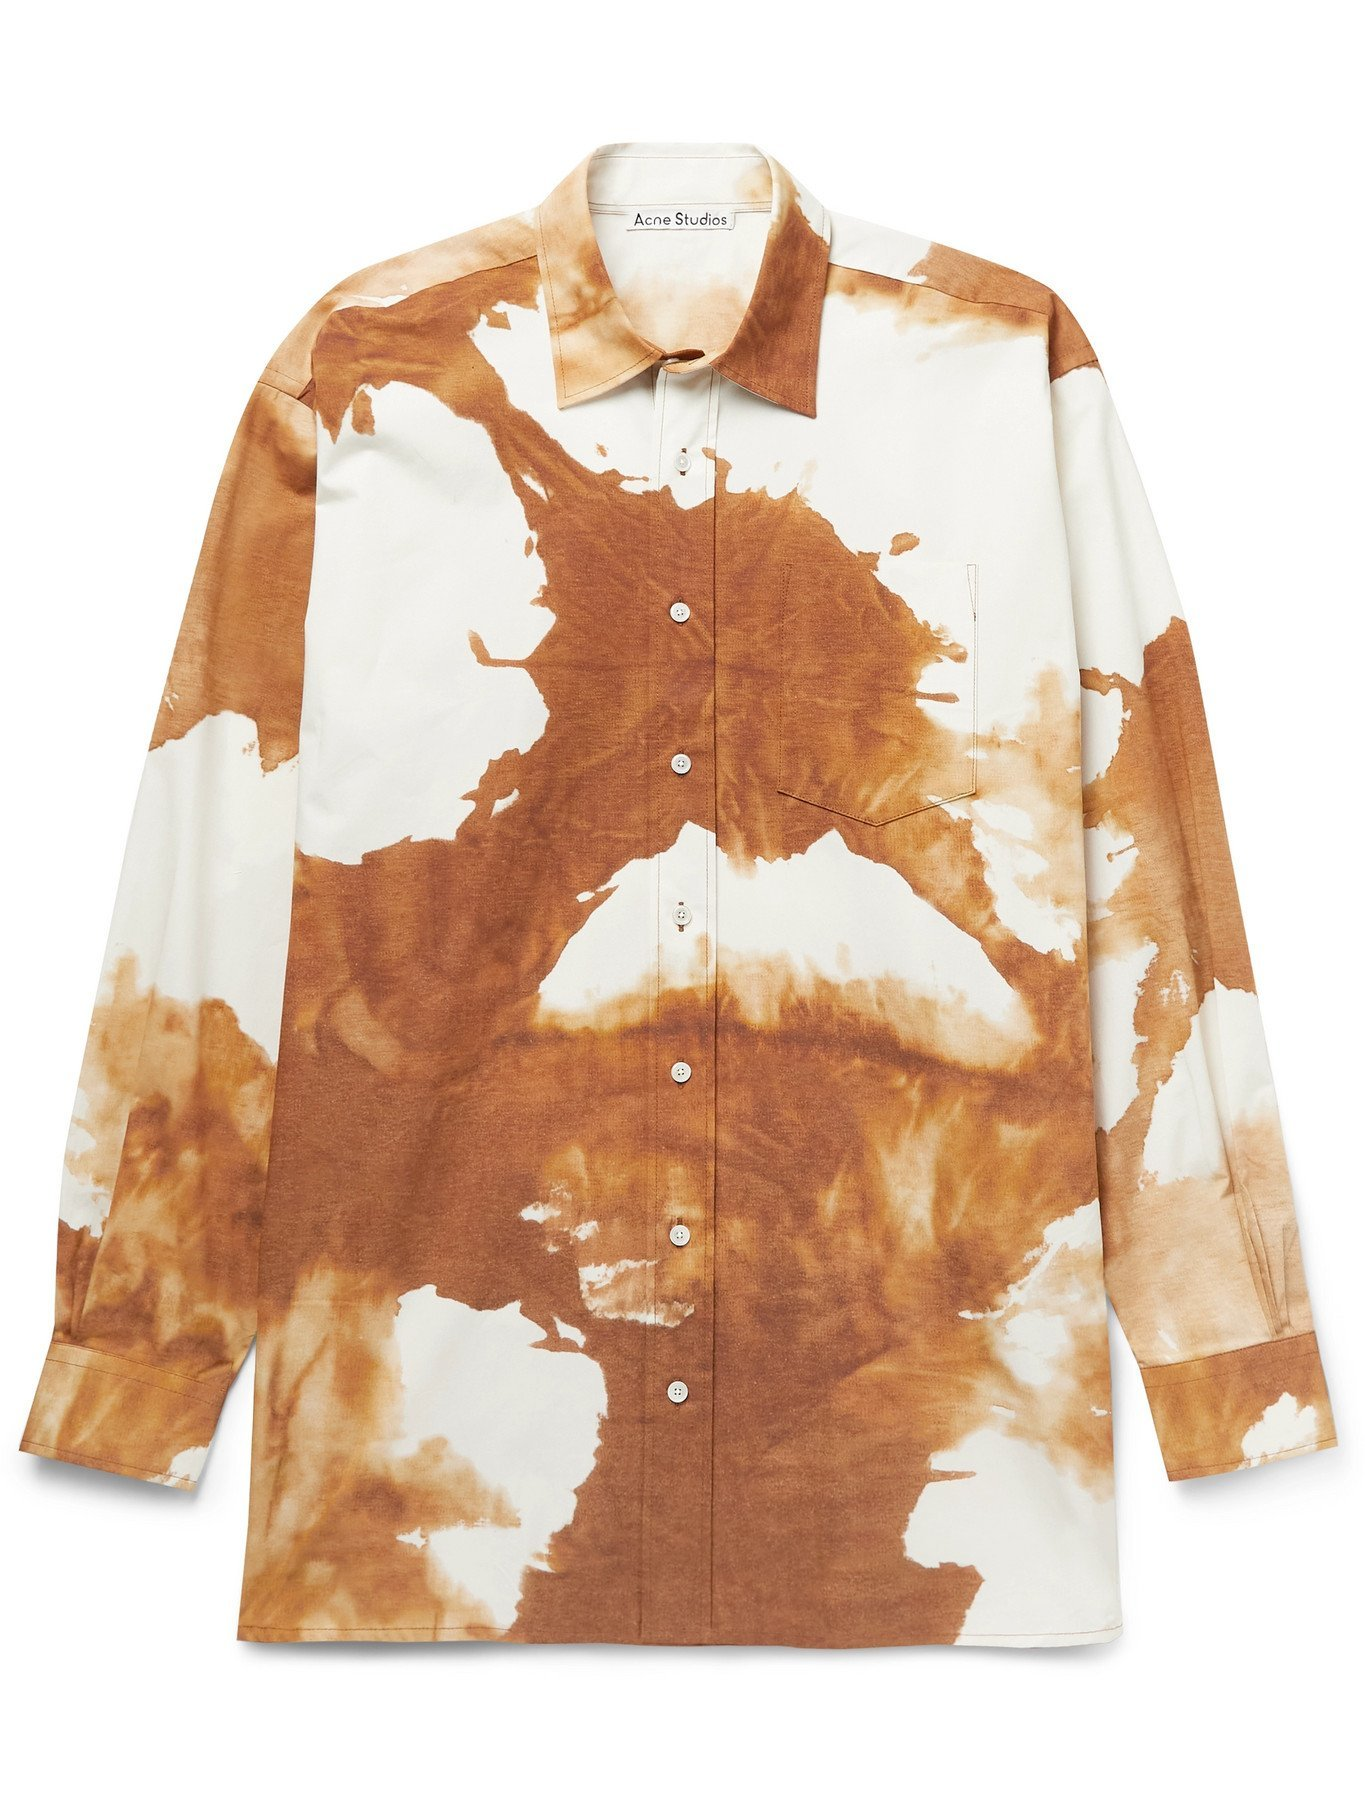 Photo: ACNE STUDIOS - Atlent Oversized Tie-Dyed Stretch-Cotton Poplin Shirt - Brown - IT 48